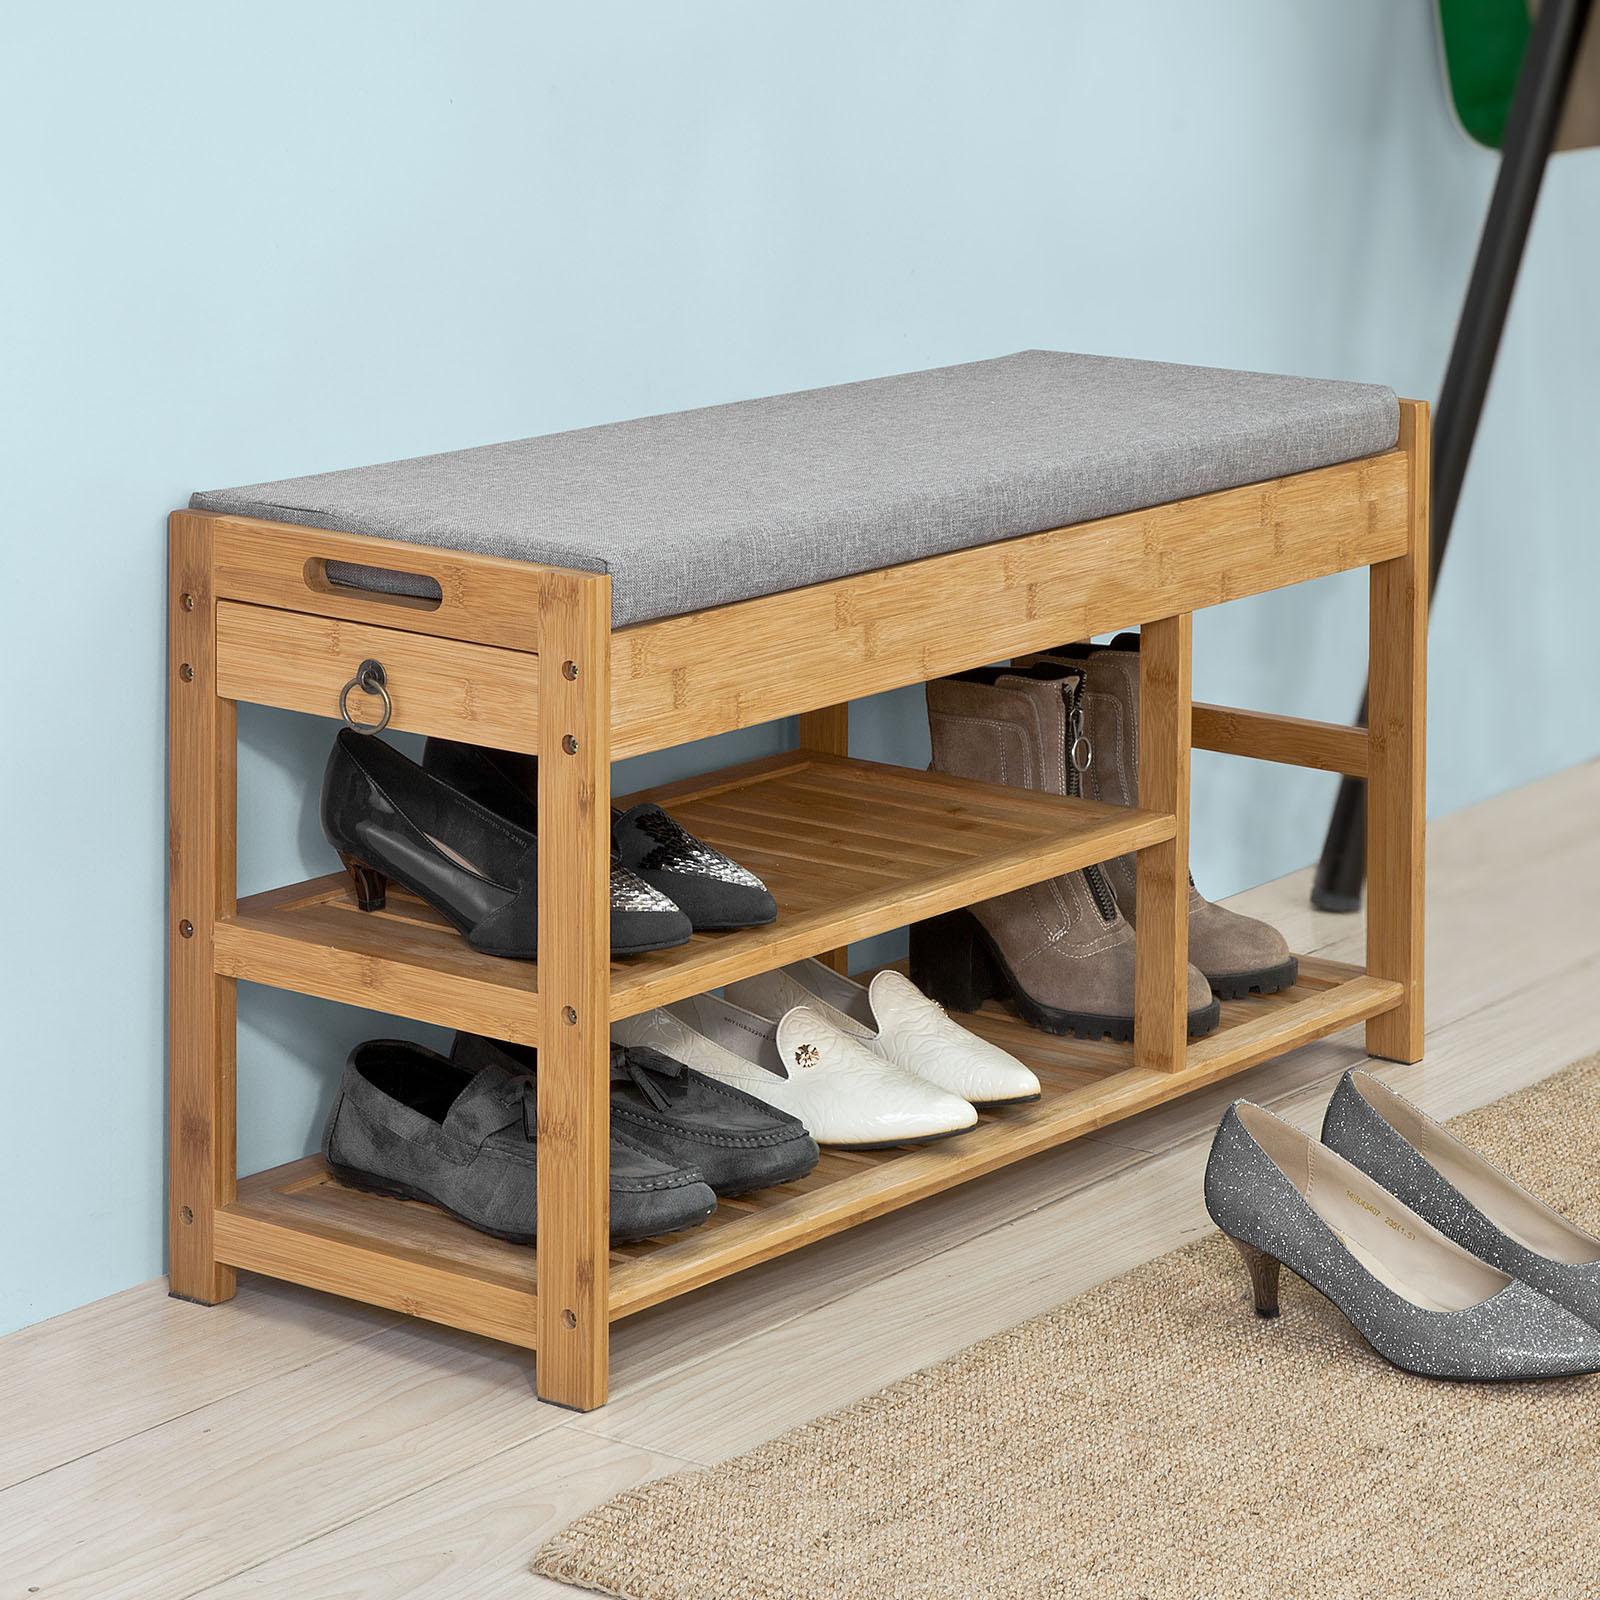 Sobuy 174 Padded Hallway Shoe Storage Rack Bench Seat With Storage Space Fsr47 N Uk 4251388601532